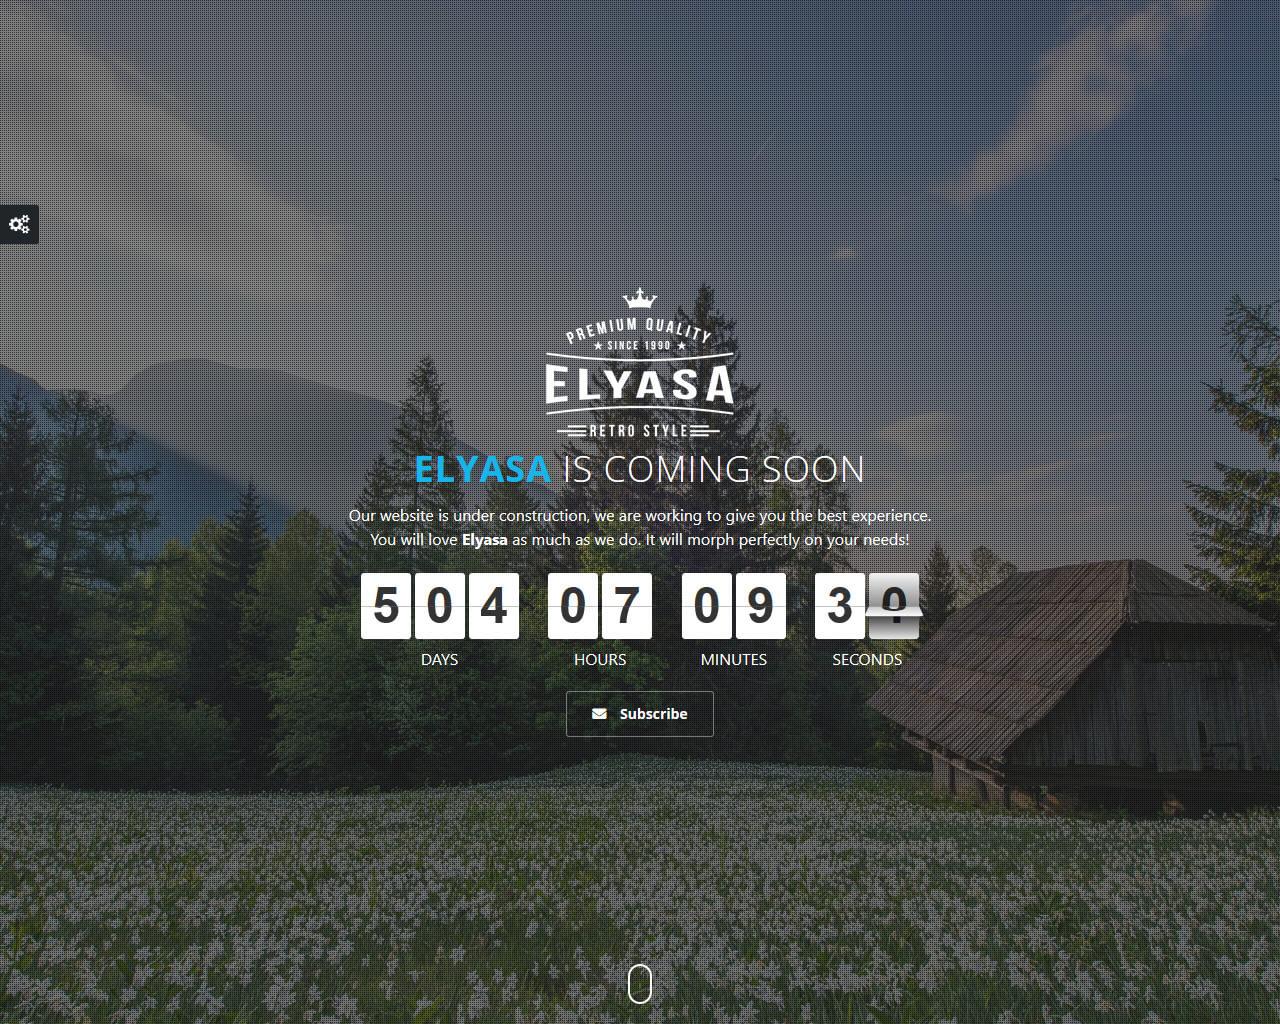 Elyasa Website Template